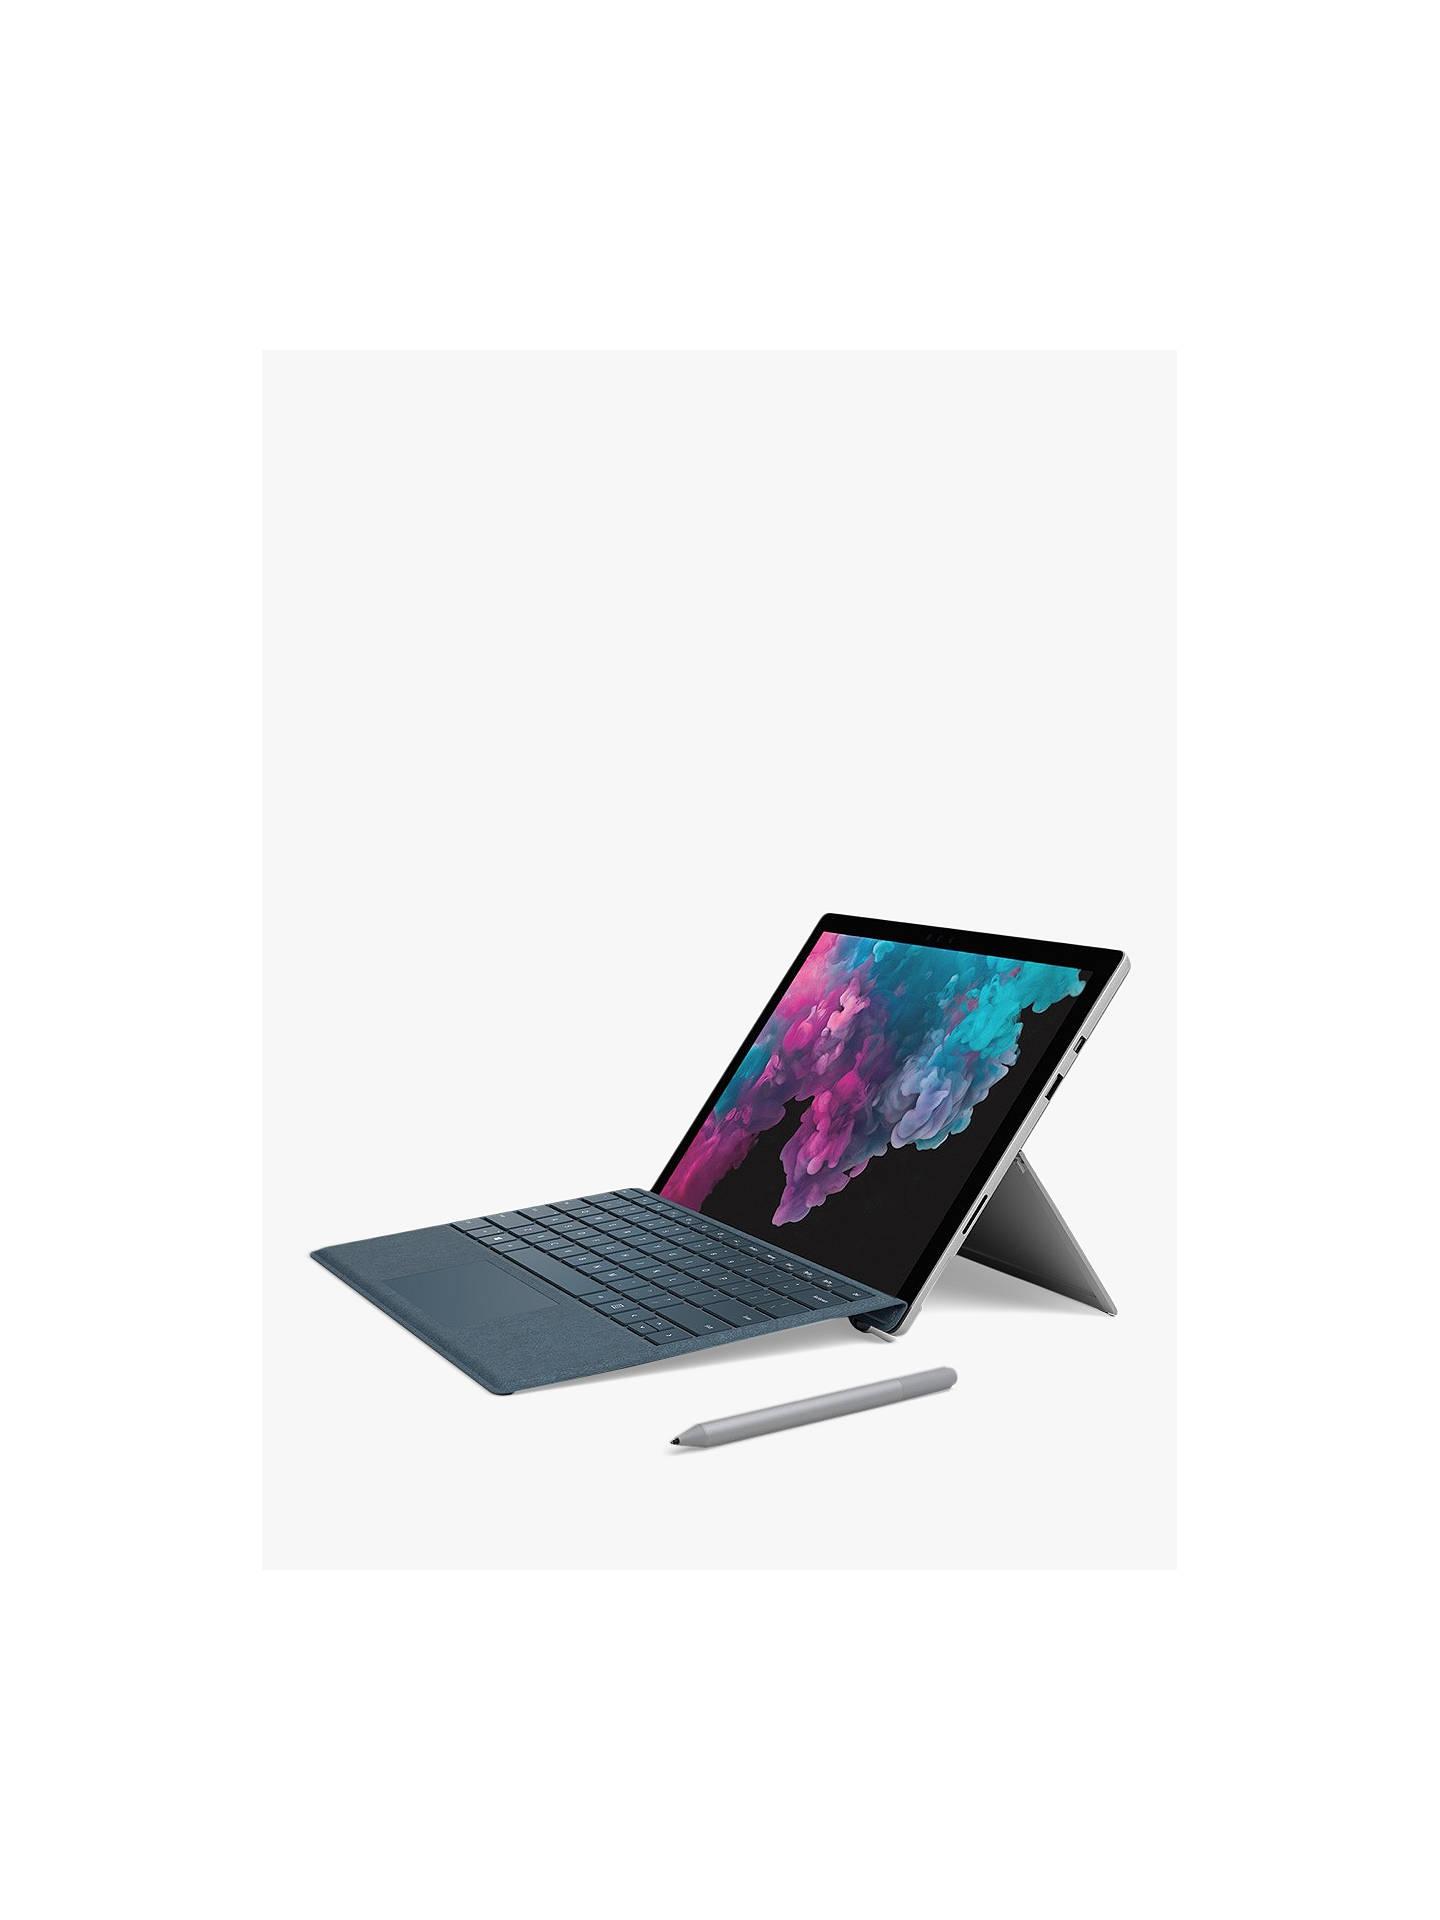 Microsoft Surface Pro 6 Tablet, Intel Core i5, 8GB RAM, 128GB SSD, 12 3